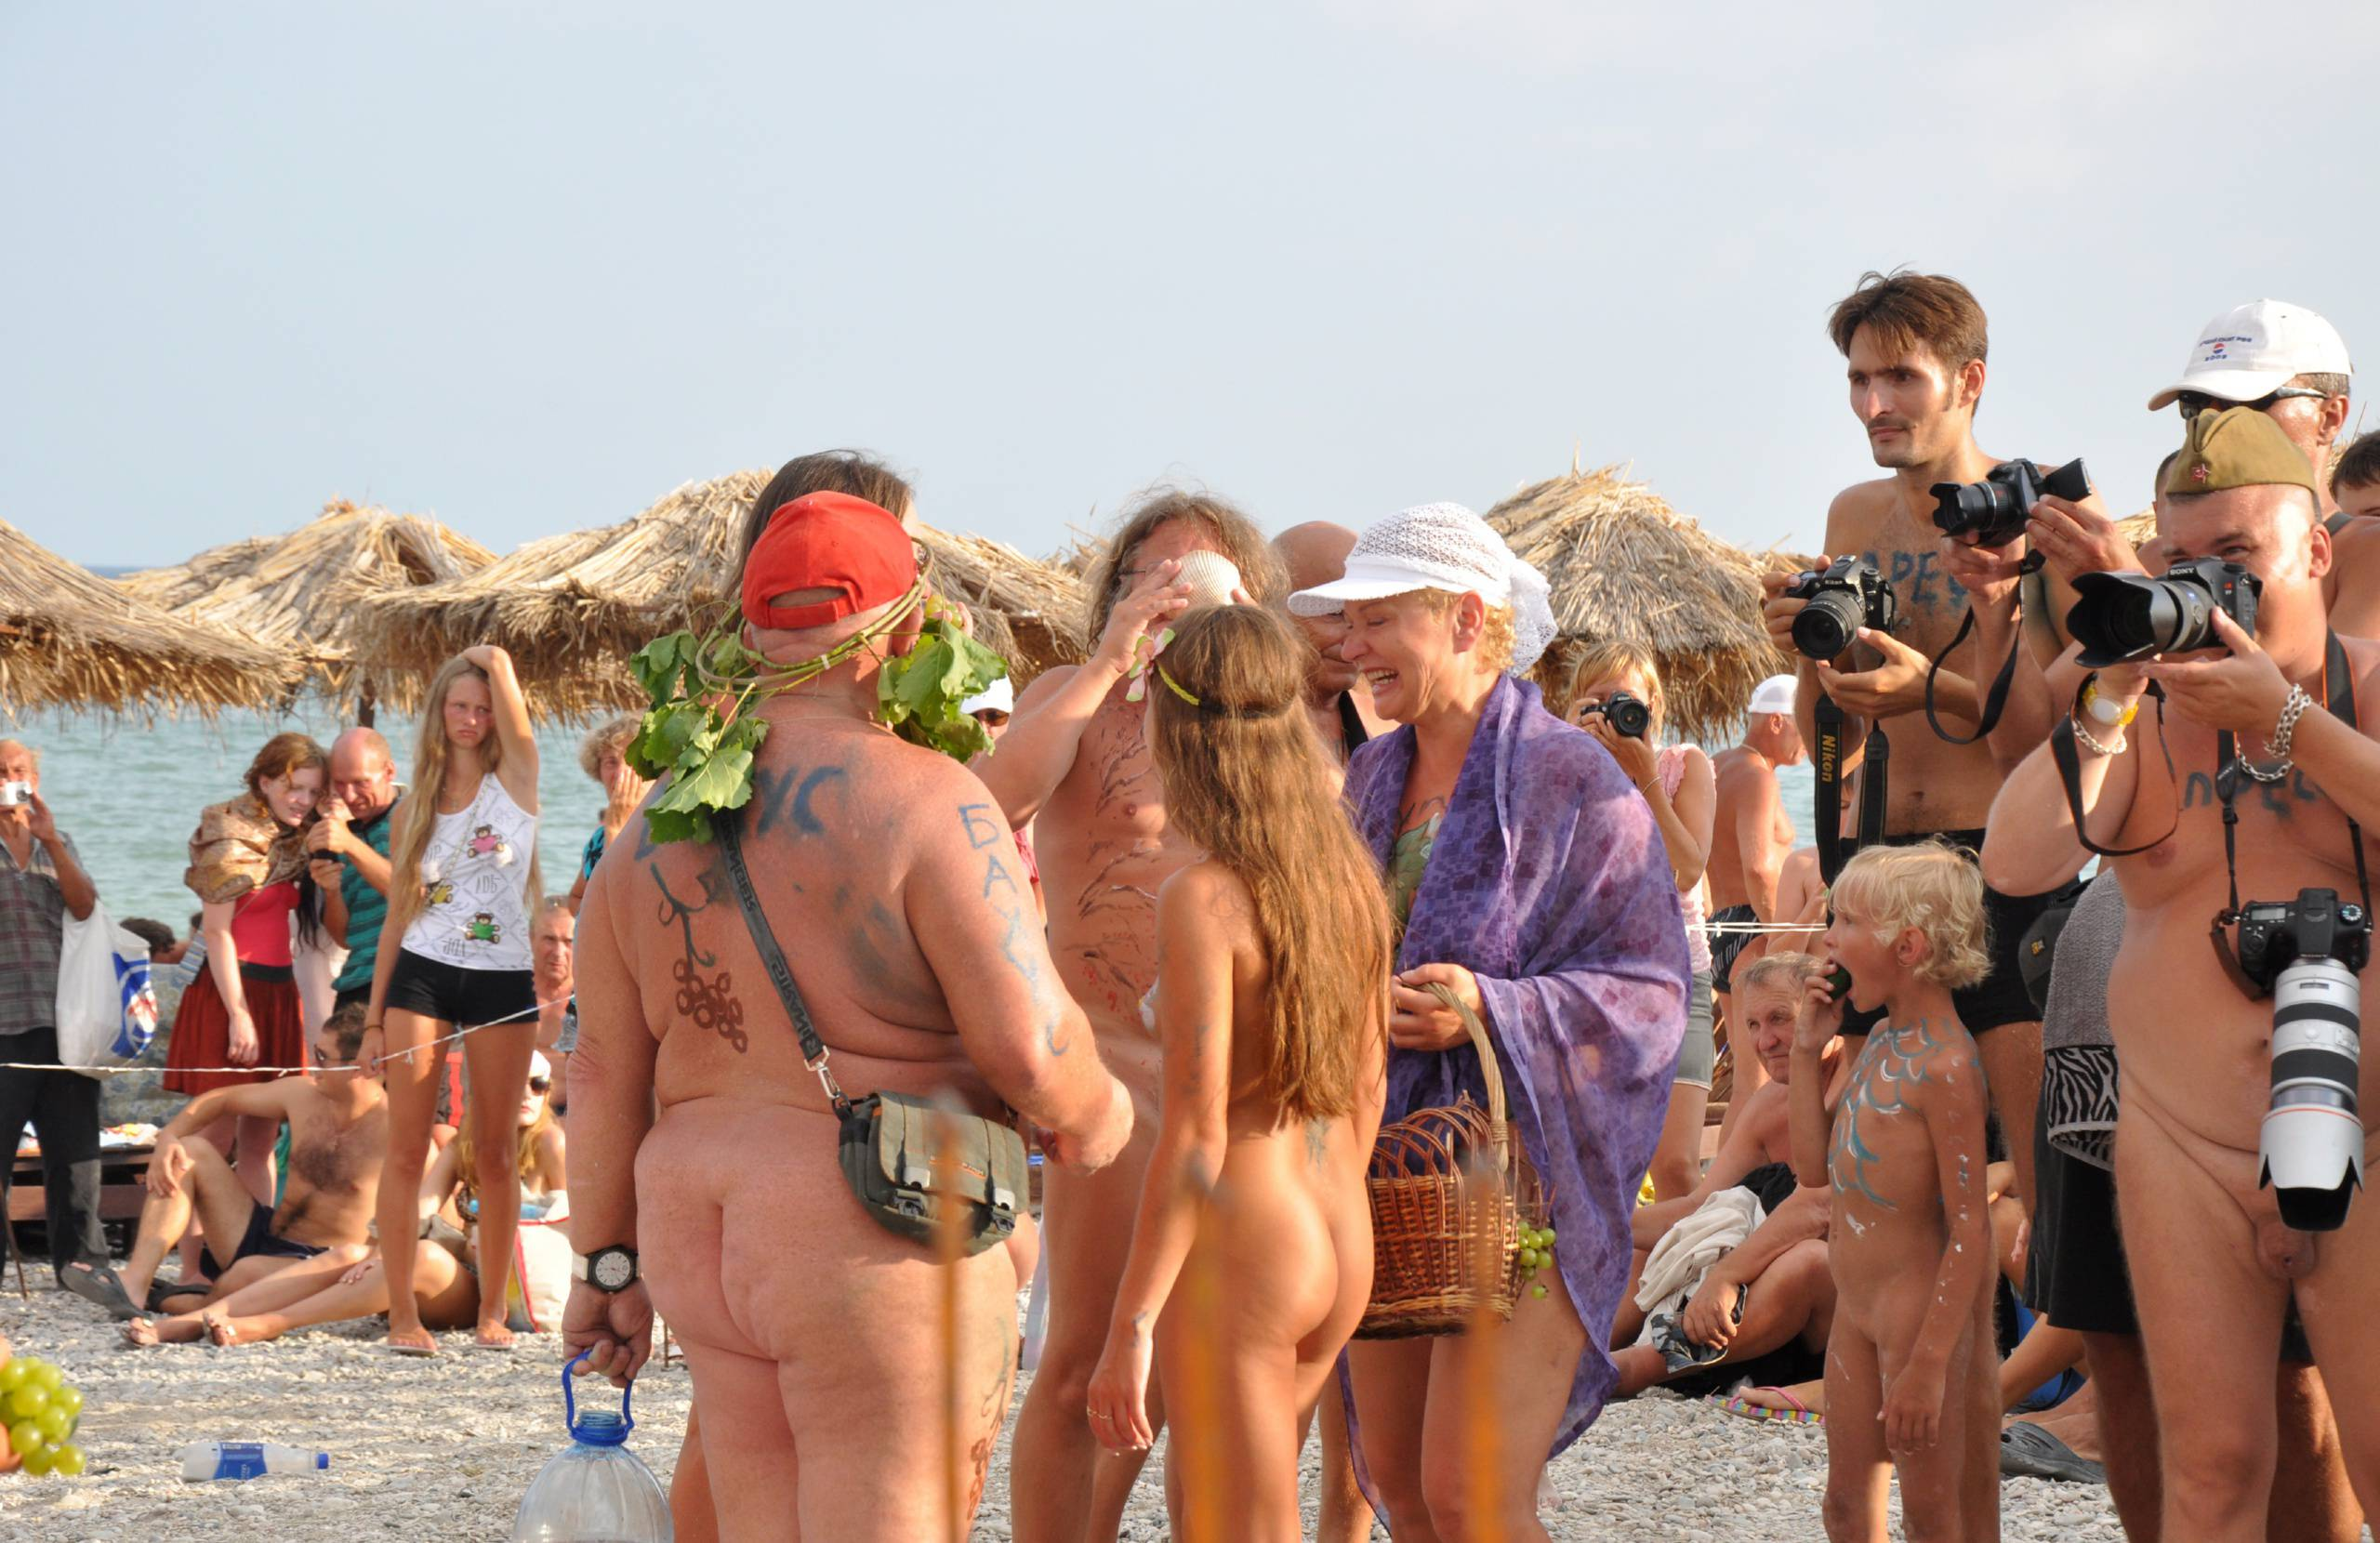 Purenudism Koktebel Beach Party - 1